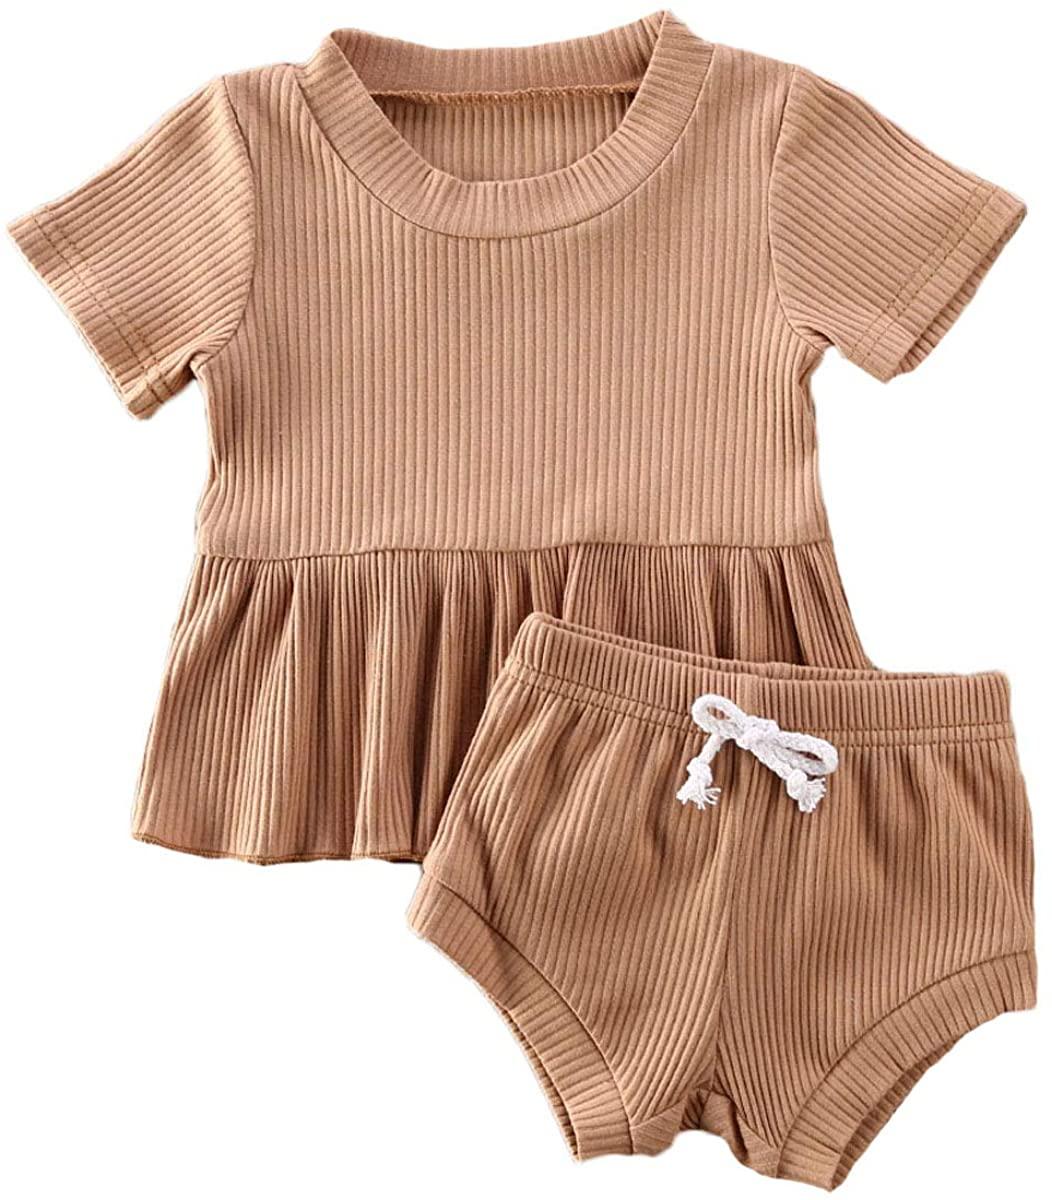 Toddler Baby Girls Ribbed Cotton Ruffled Shirts Tops + High Waisted Shorts Pants Baby Girl Clothes Set